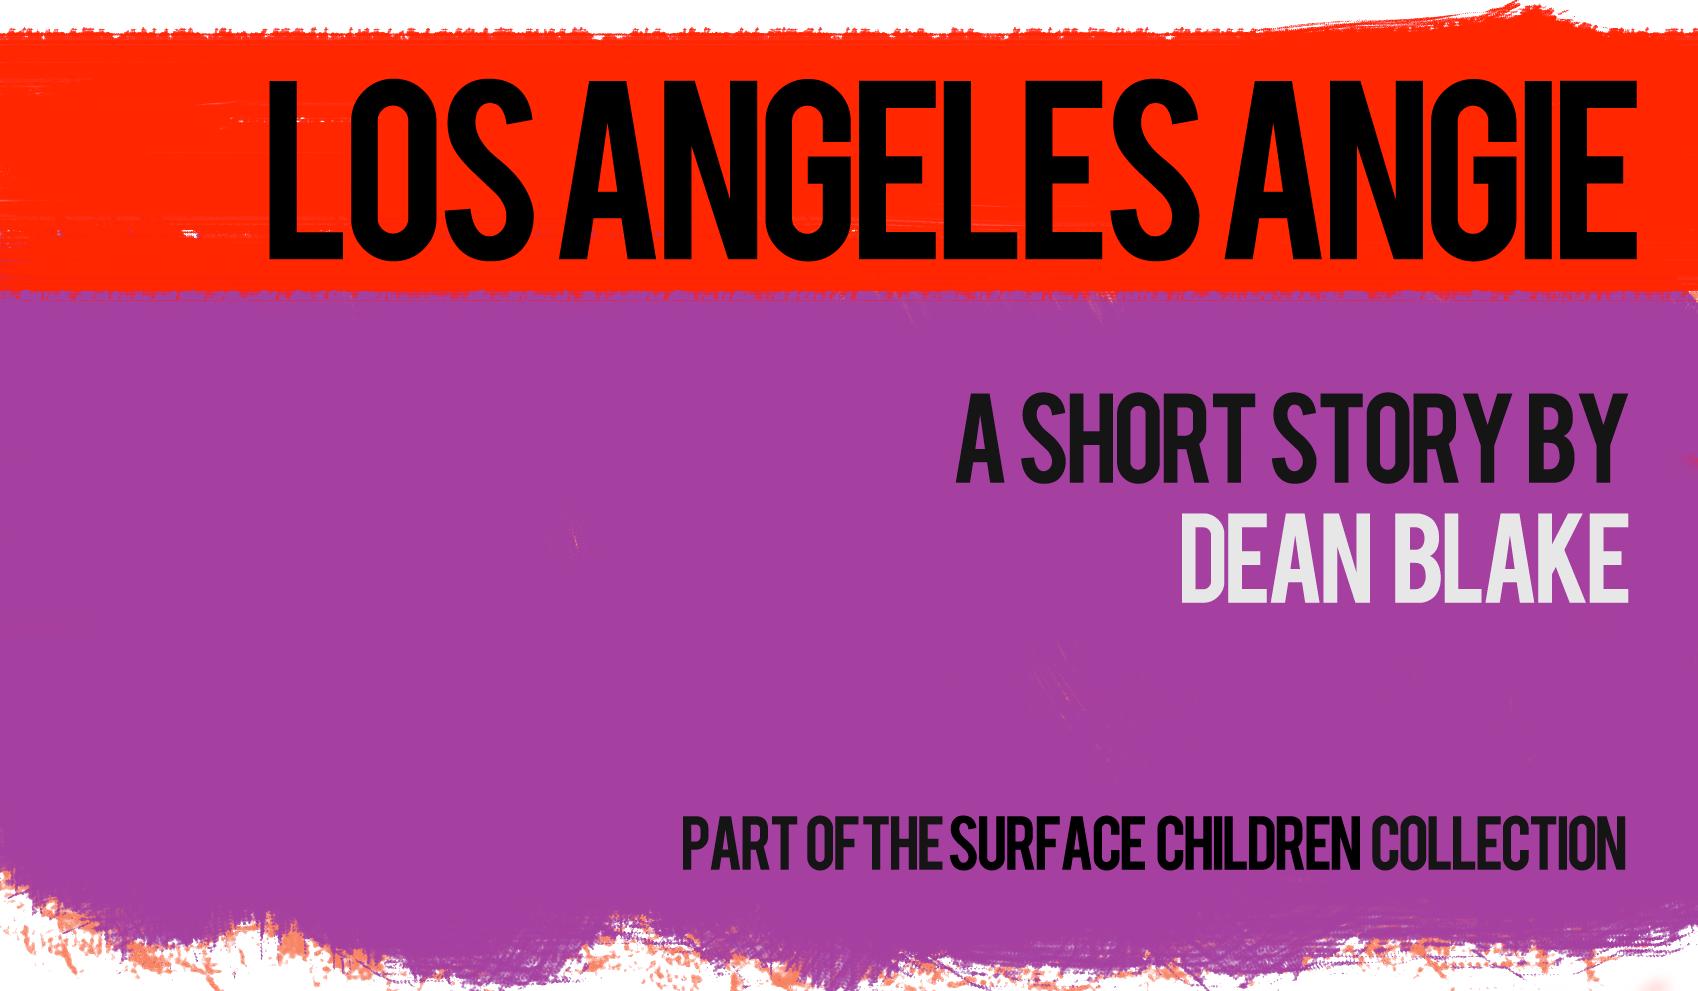 Los Angeles Angie